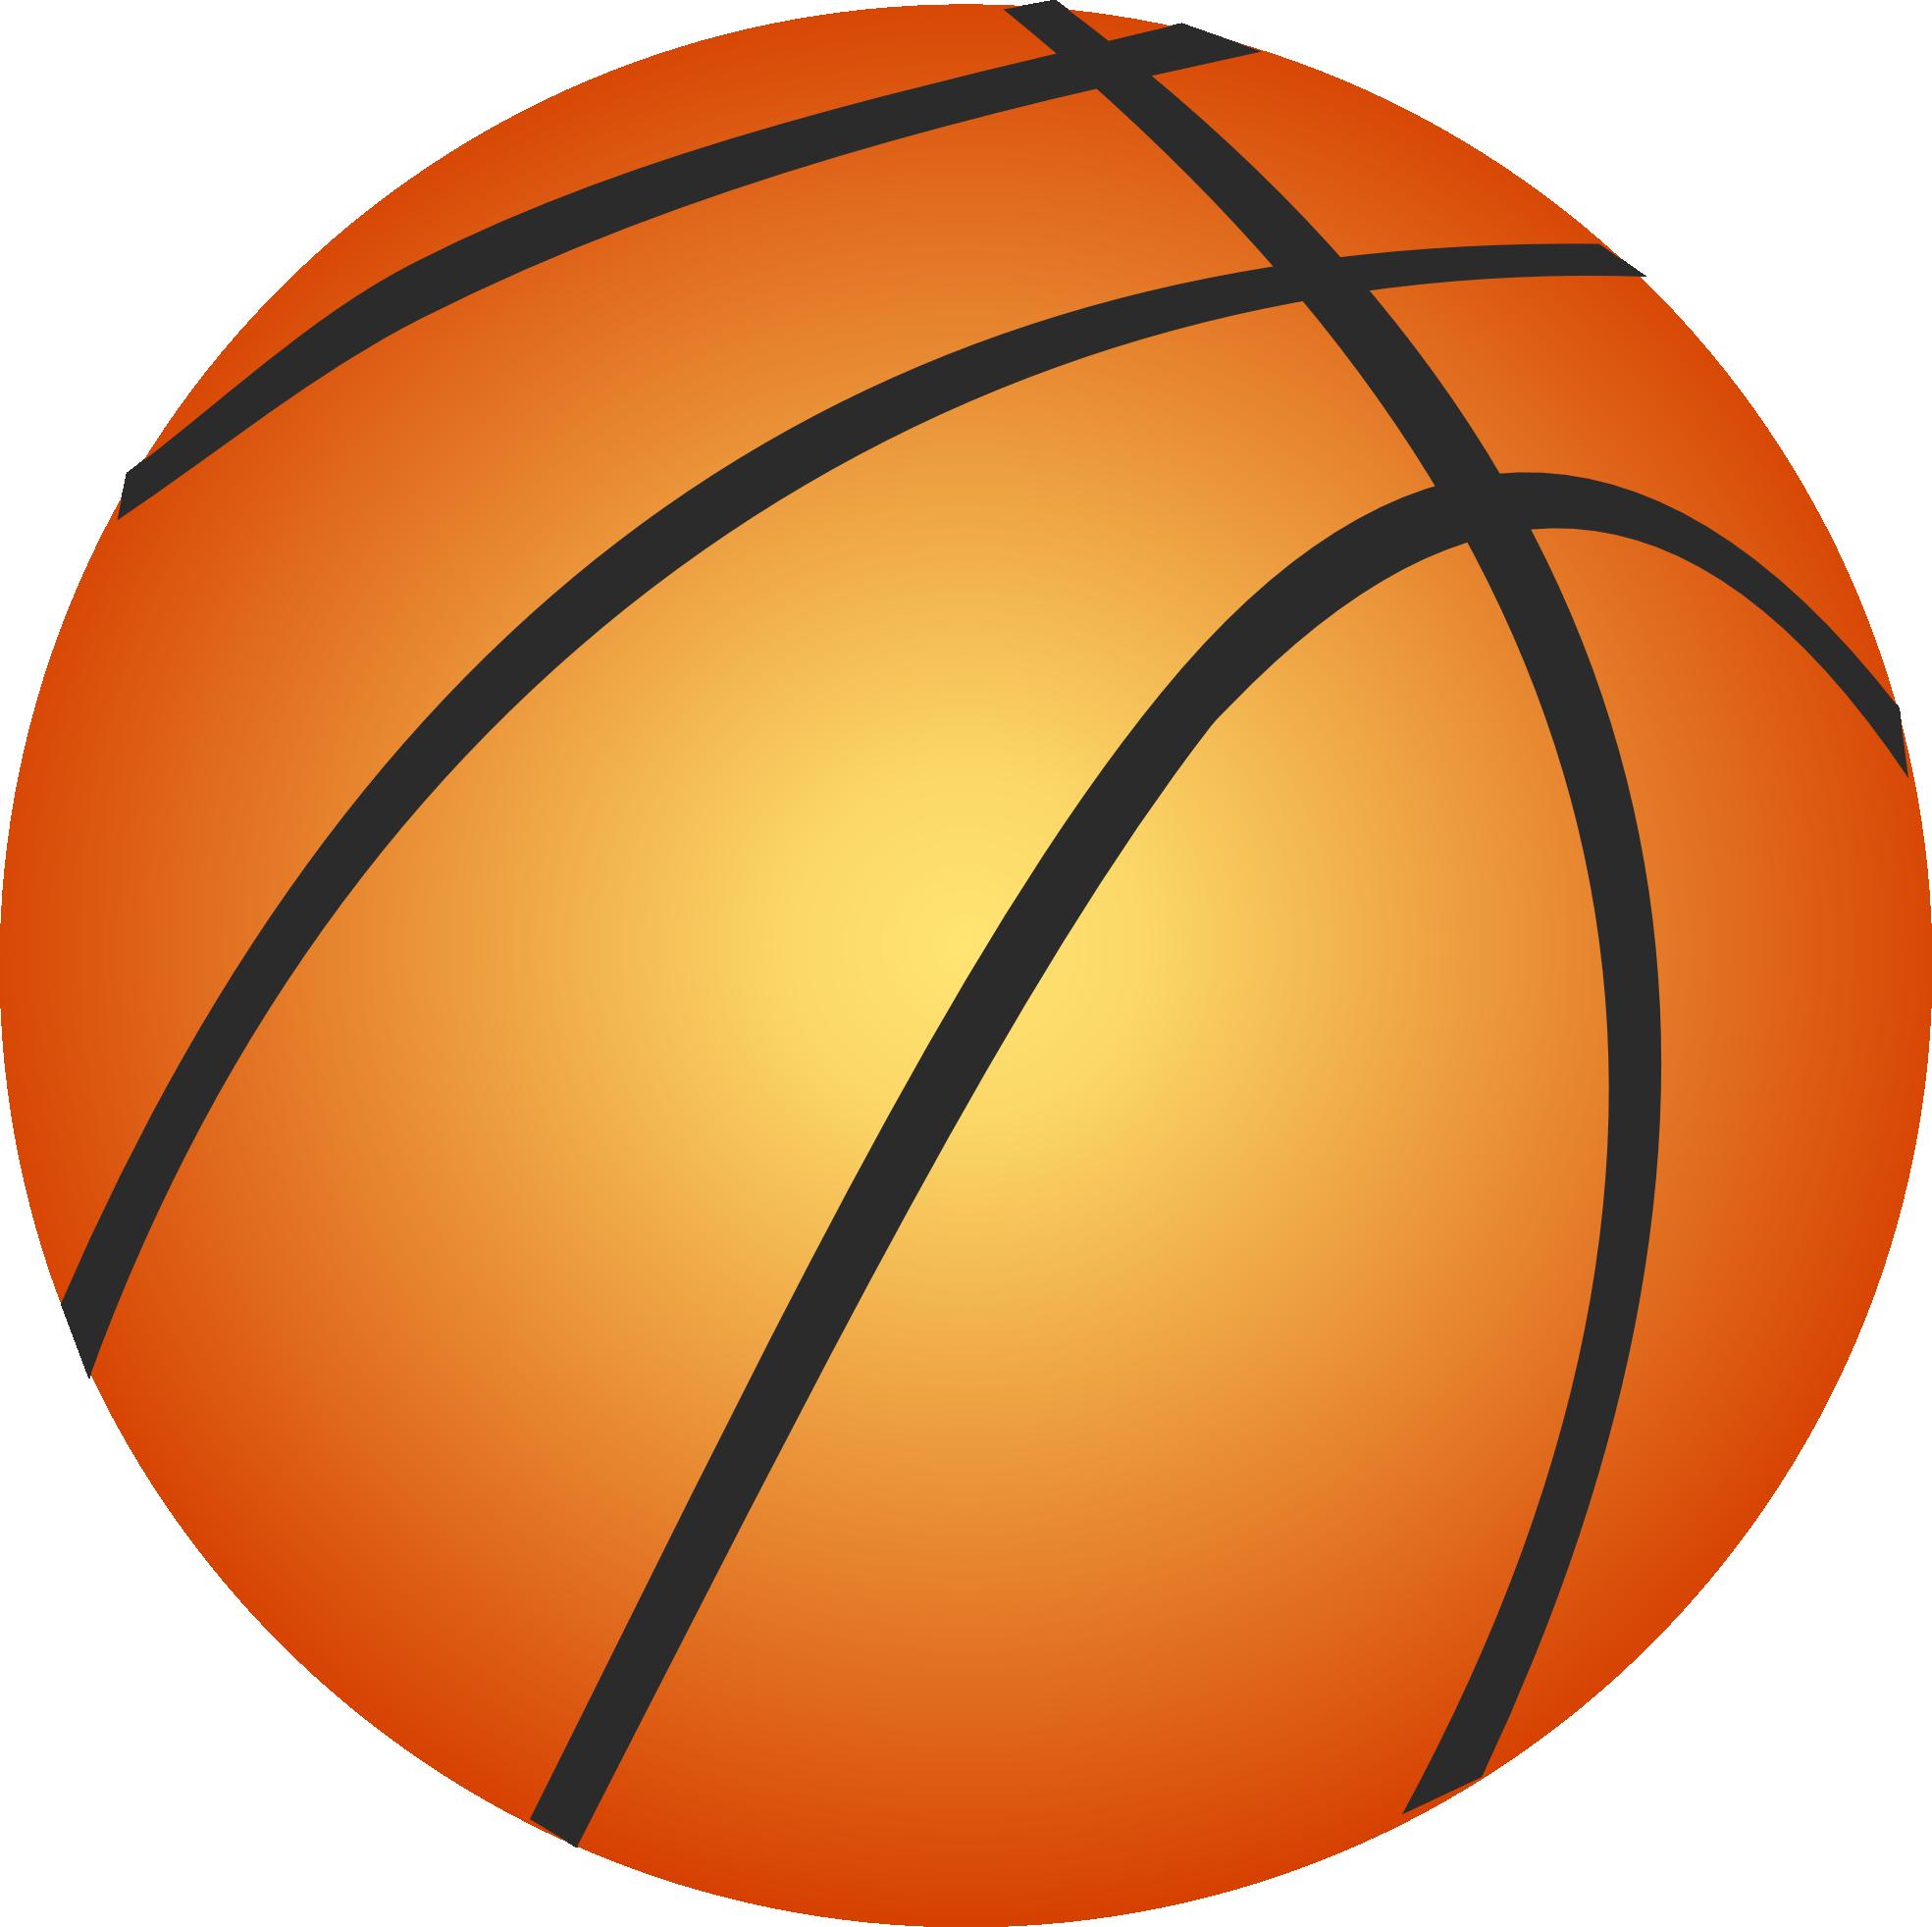 clip 1 clipart basketball. Basket ball